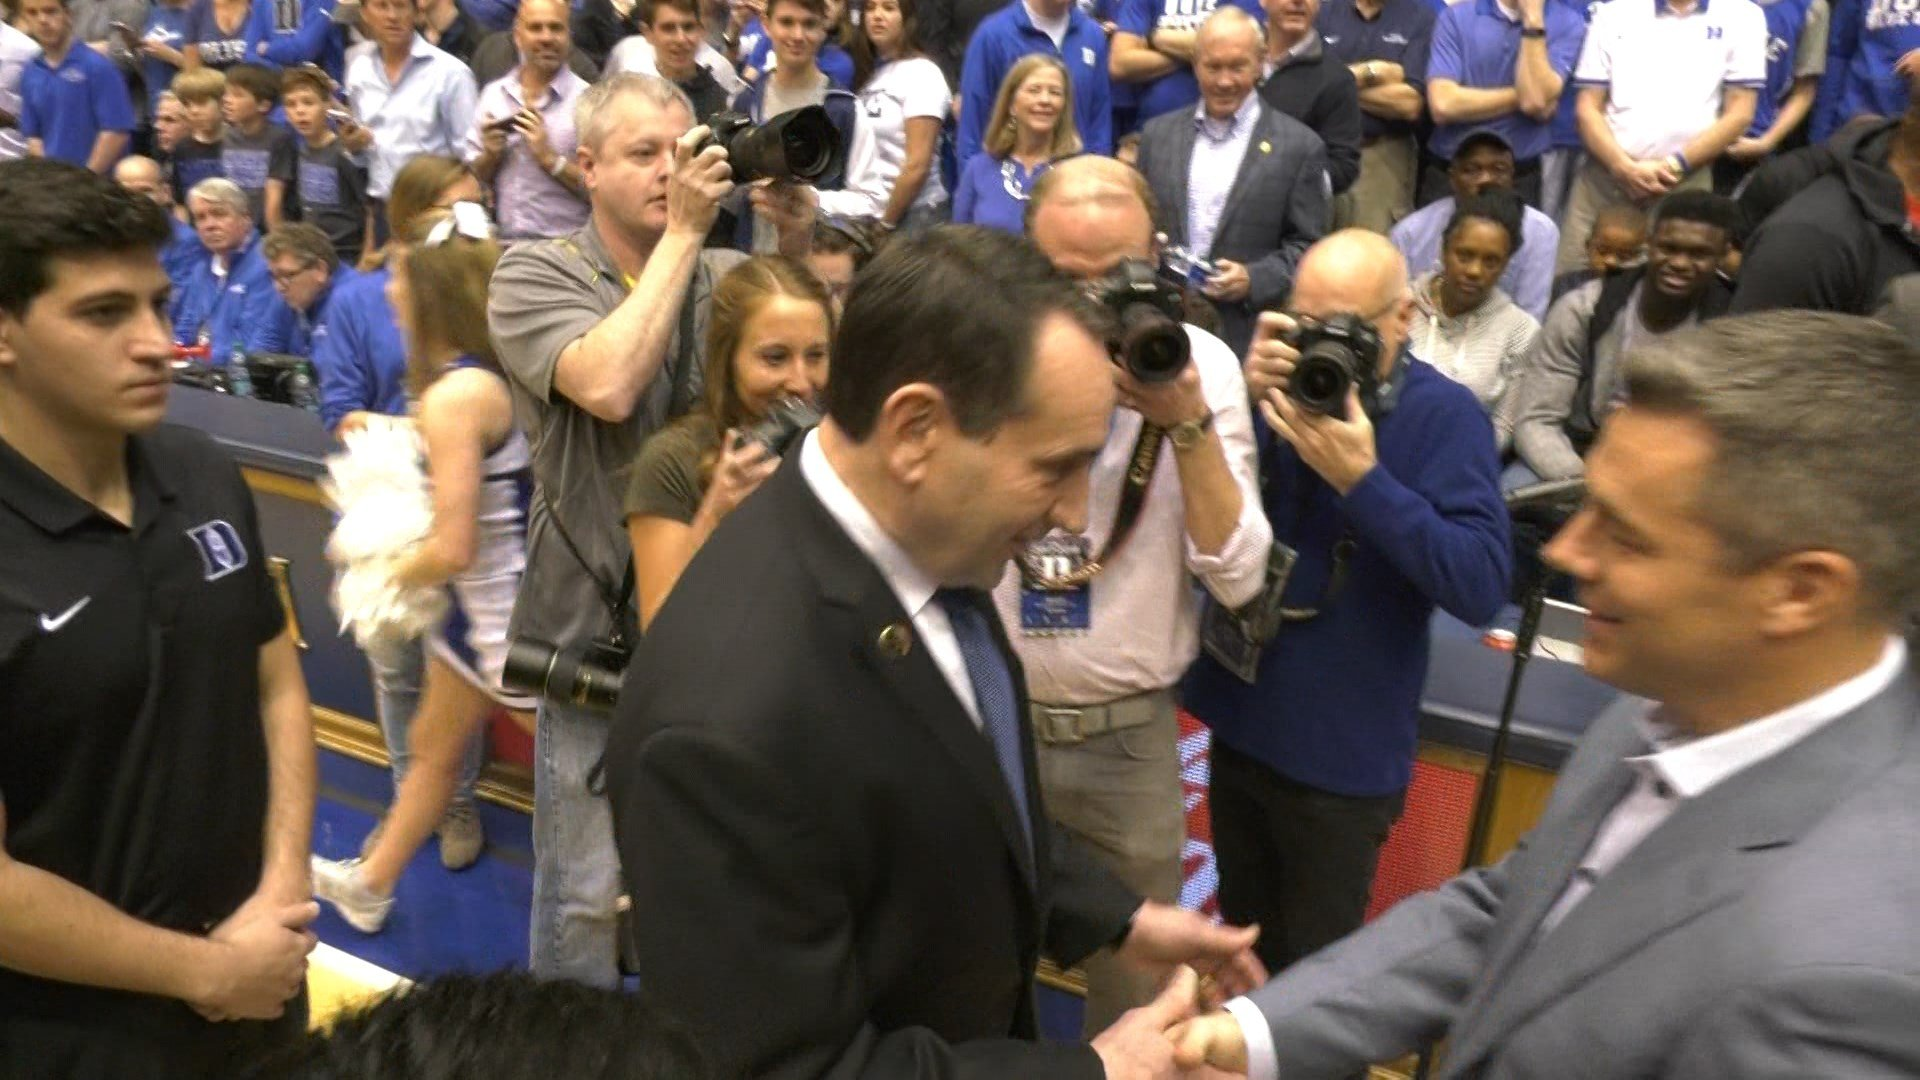 Virginia beat Duke 65-63 last year at Cameron Indoor Stadium